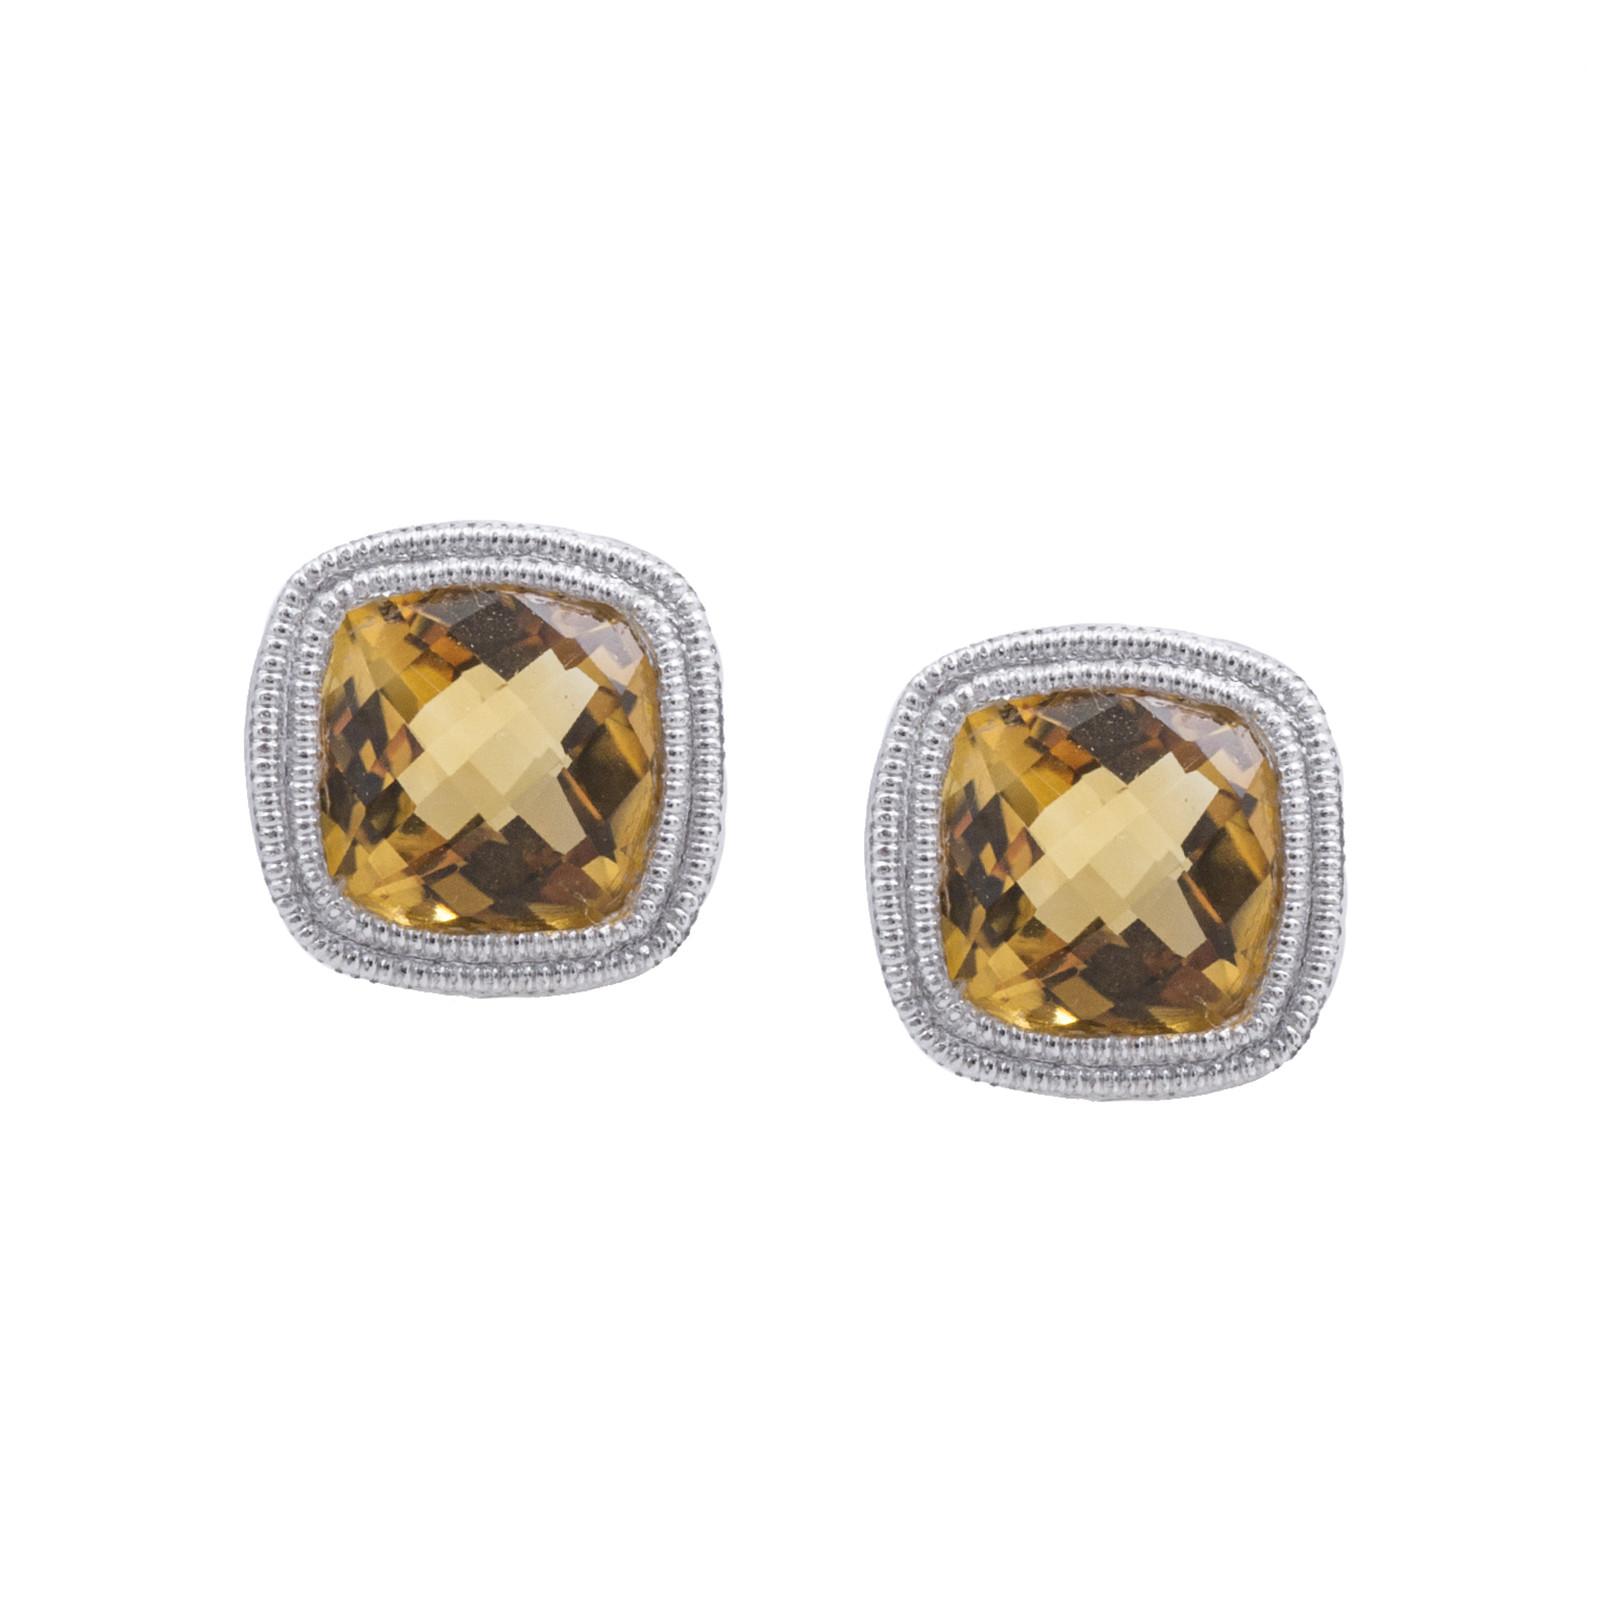 New 1.80 CTW Citrine Stud Earrings